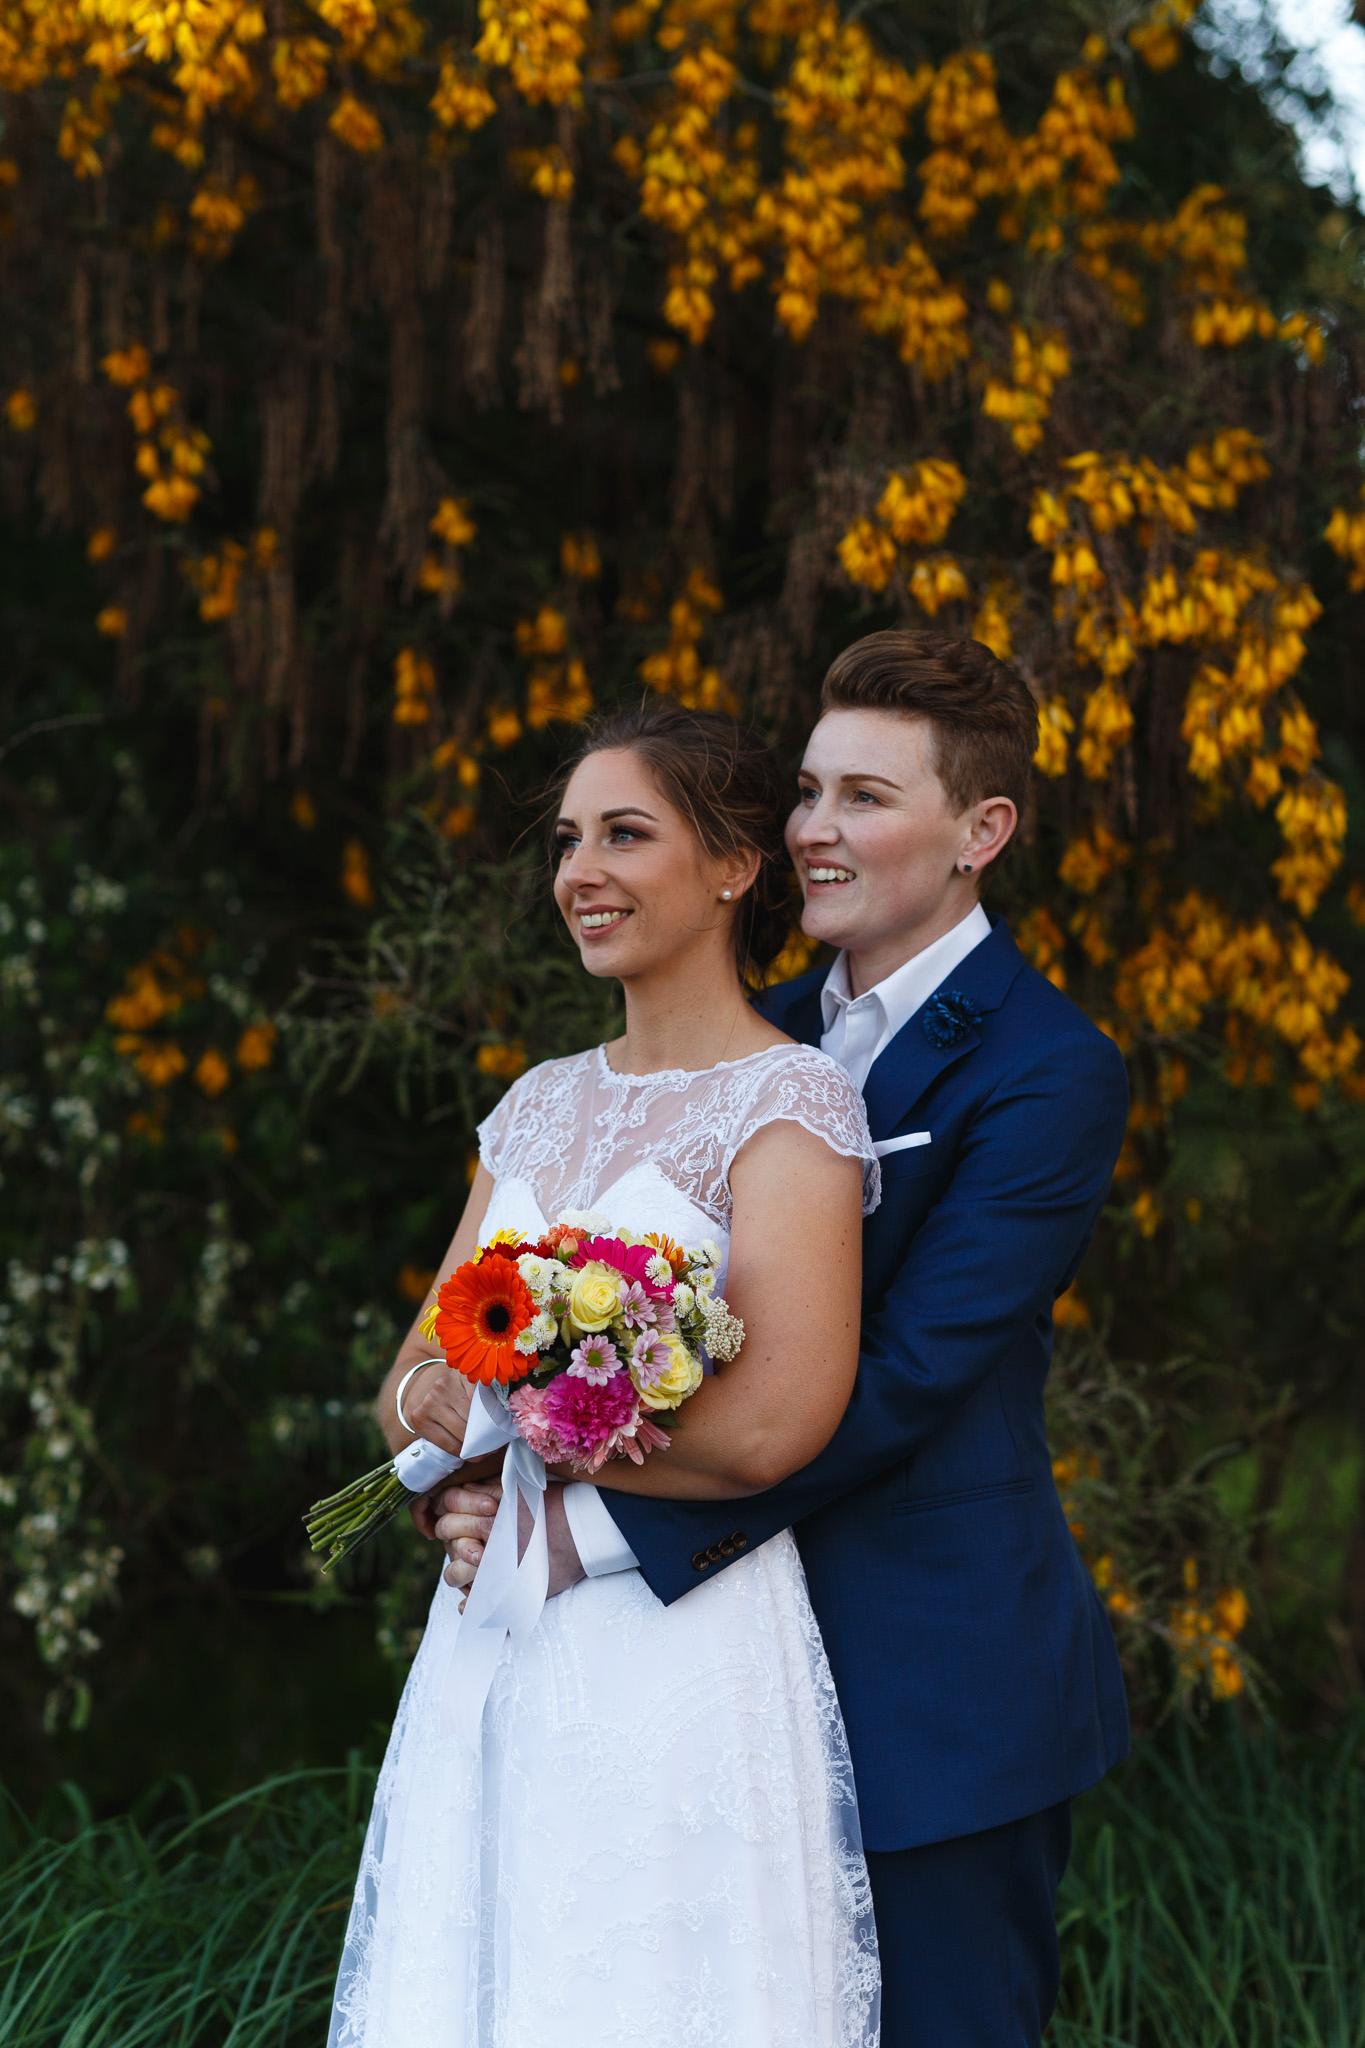 palmerston-north-wedding-photography-highlight-new-zealand.jpg-561.jpg